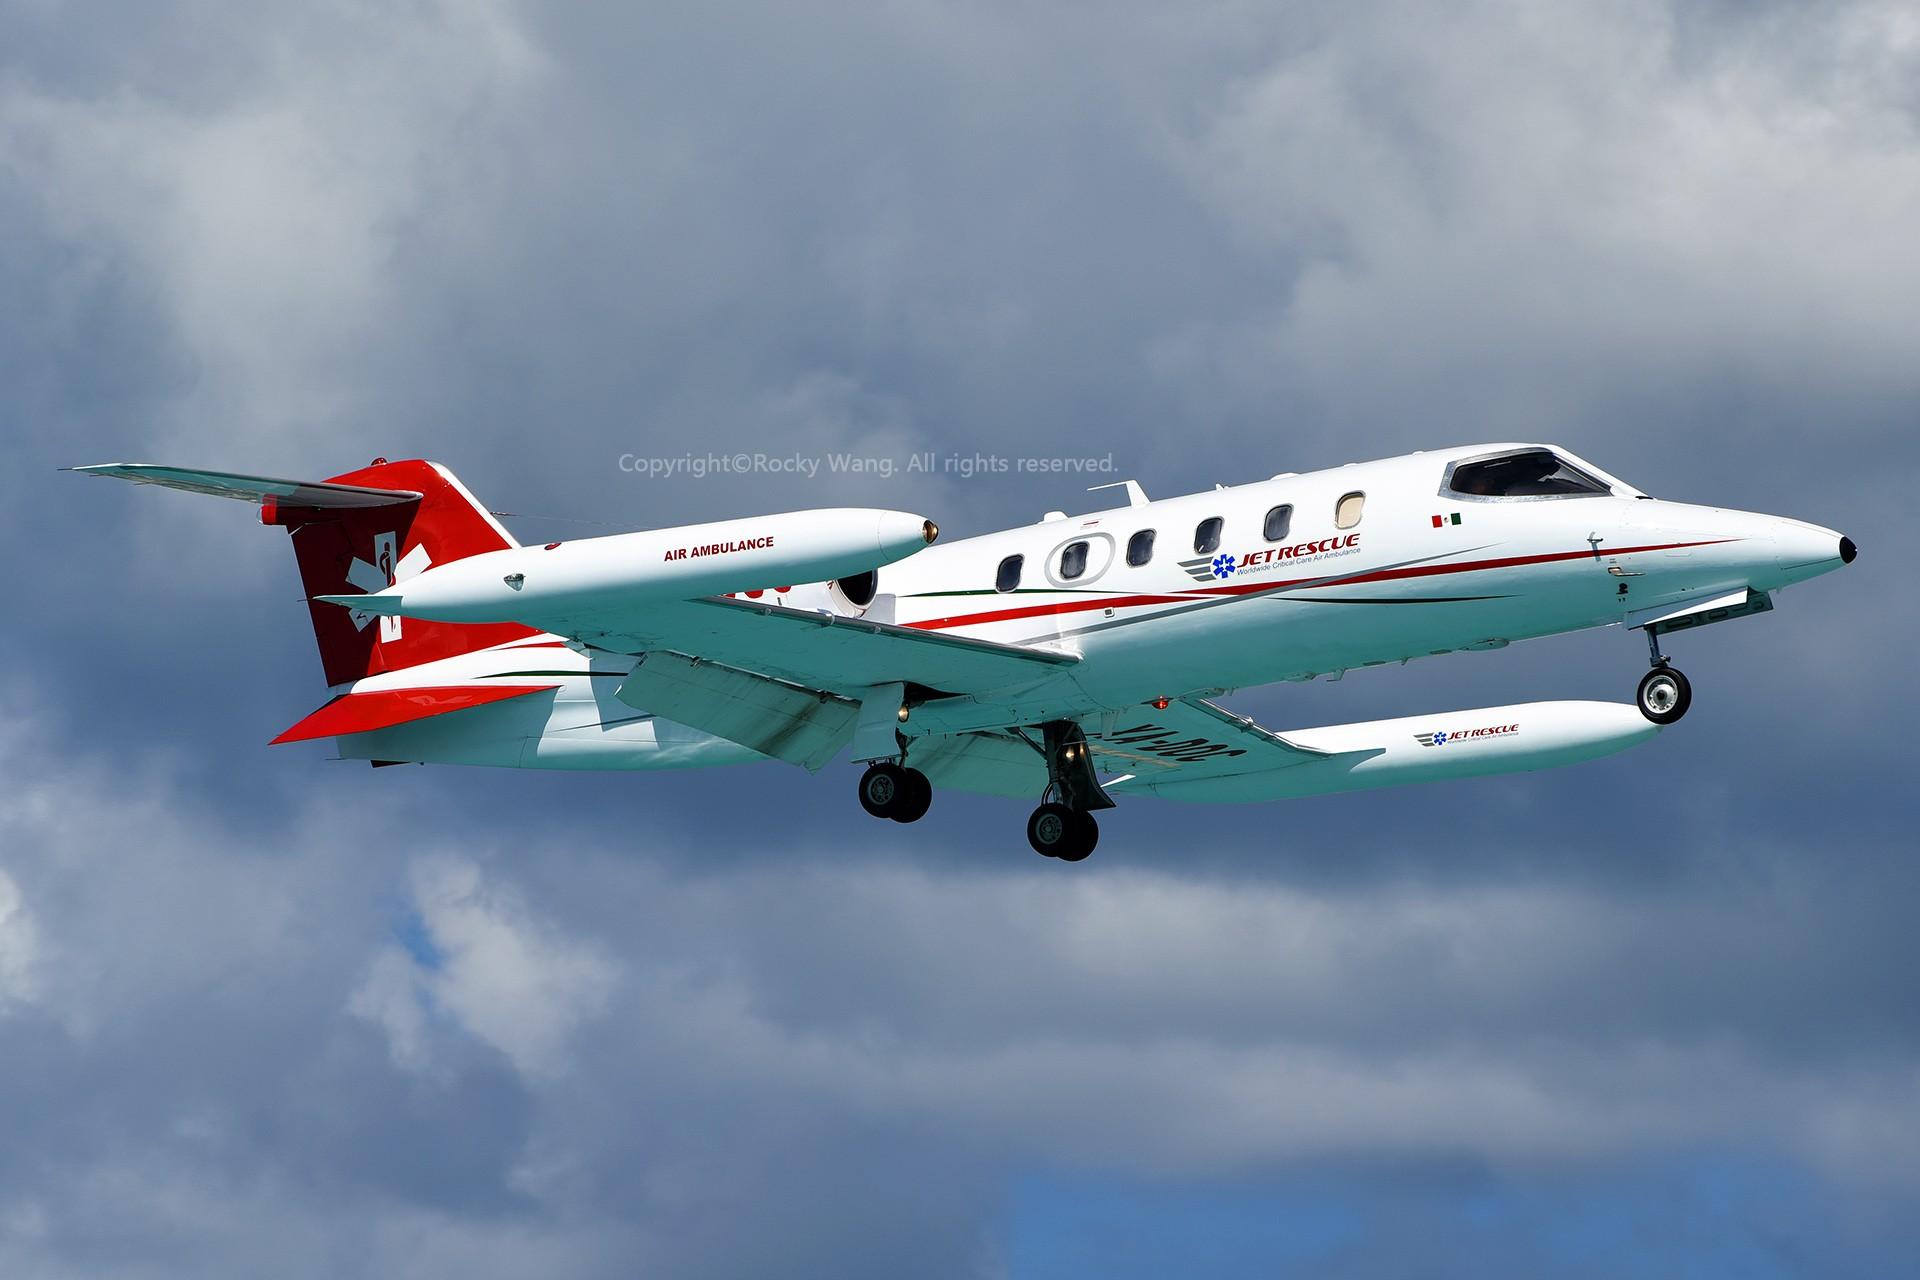 Re:[原创]My endless Caribbean dream——圣马丁朱莉安娜公主机场拍机记 BOMBARDIER LEARJET 35A XA-DOC 荷属安的列斯群岛朱利安娜公主机场